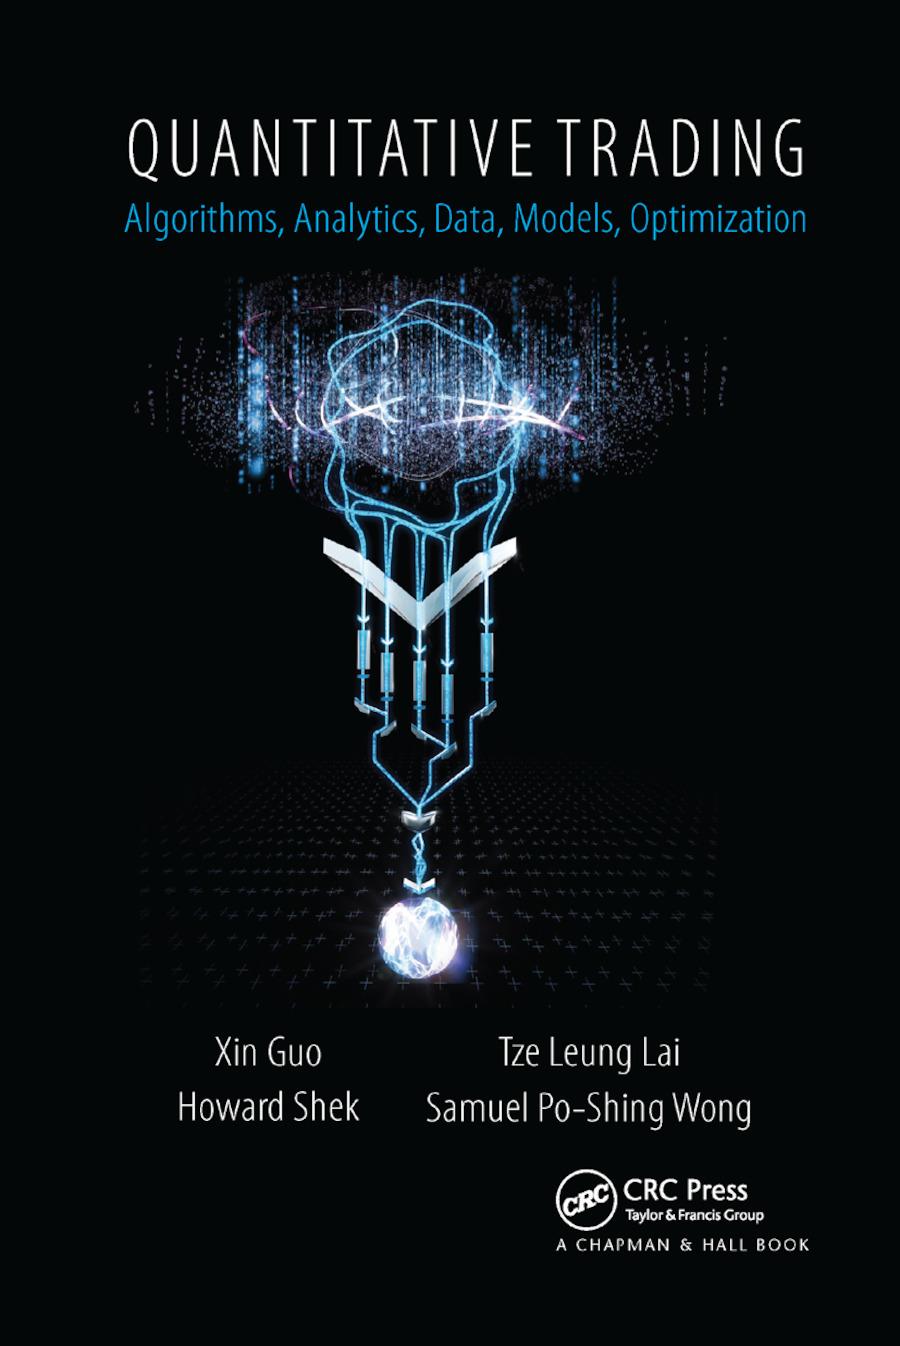 Quantitative Trading: Algorithms, Analytics, Data, Models, Optimization book cover